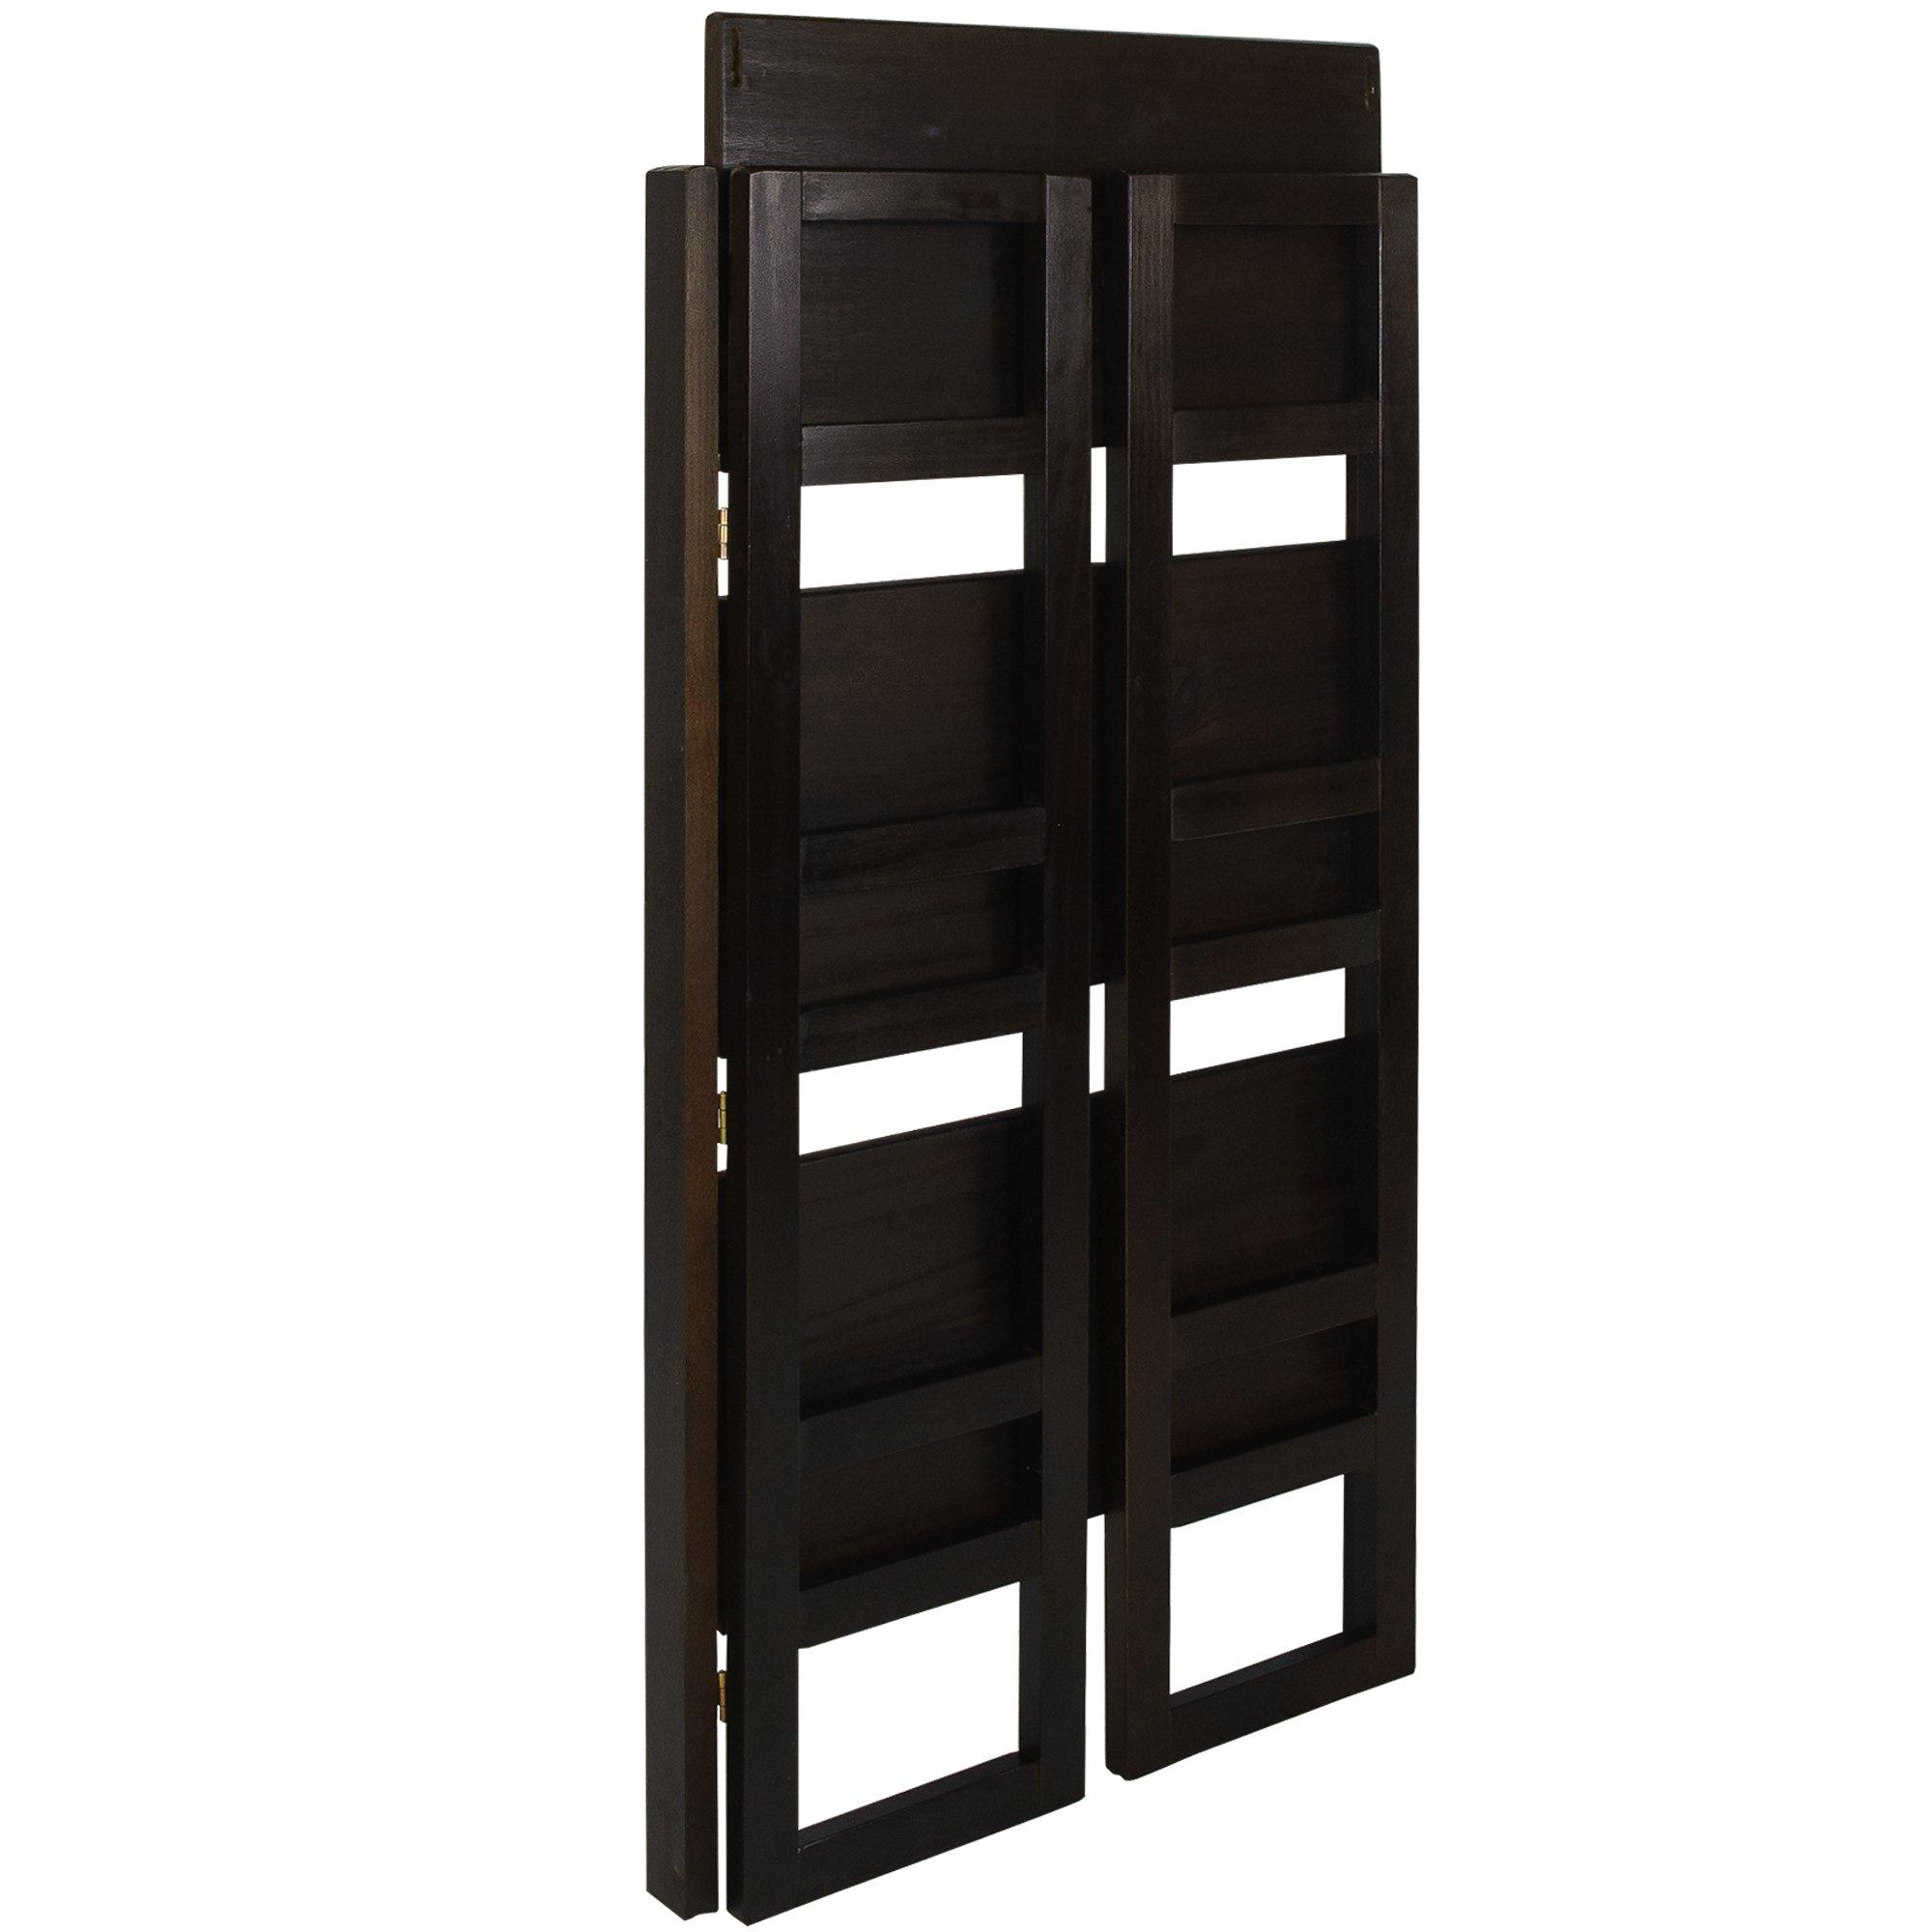 Bookshelf 20 Inches Wide